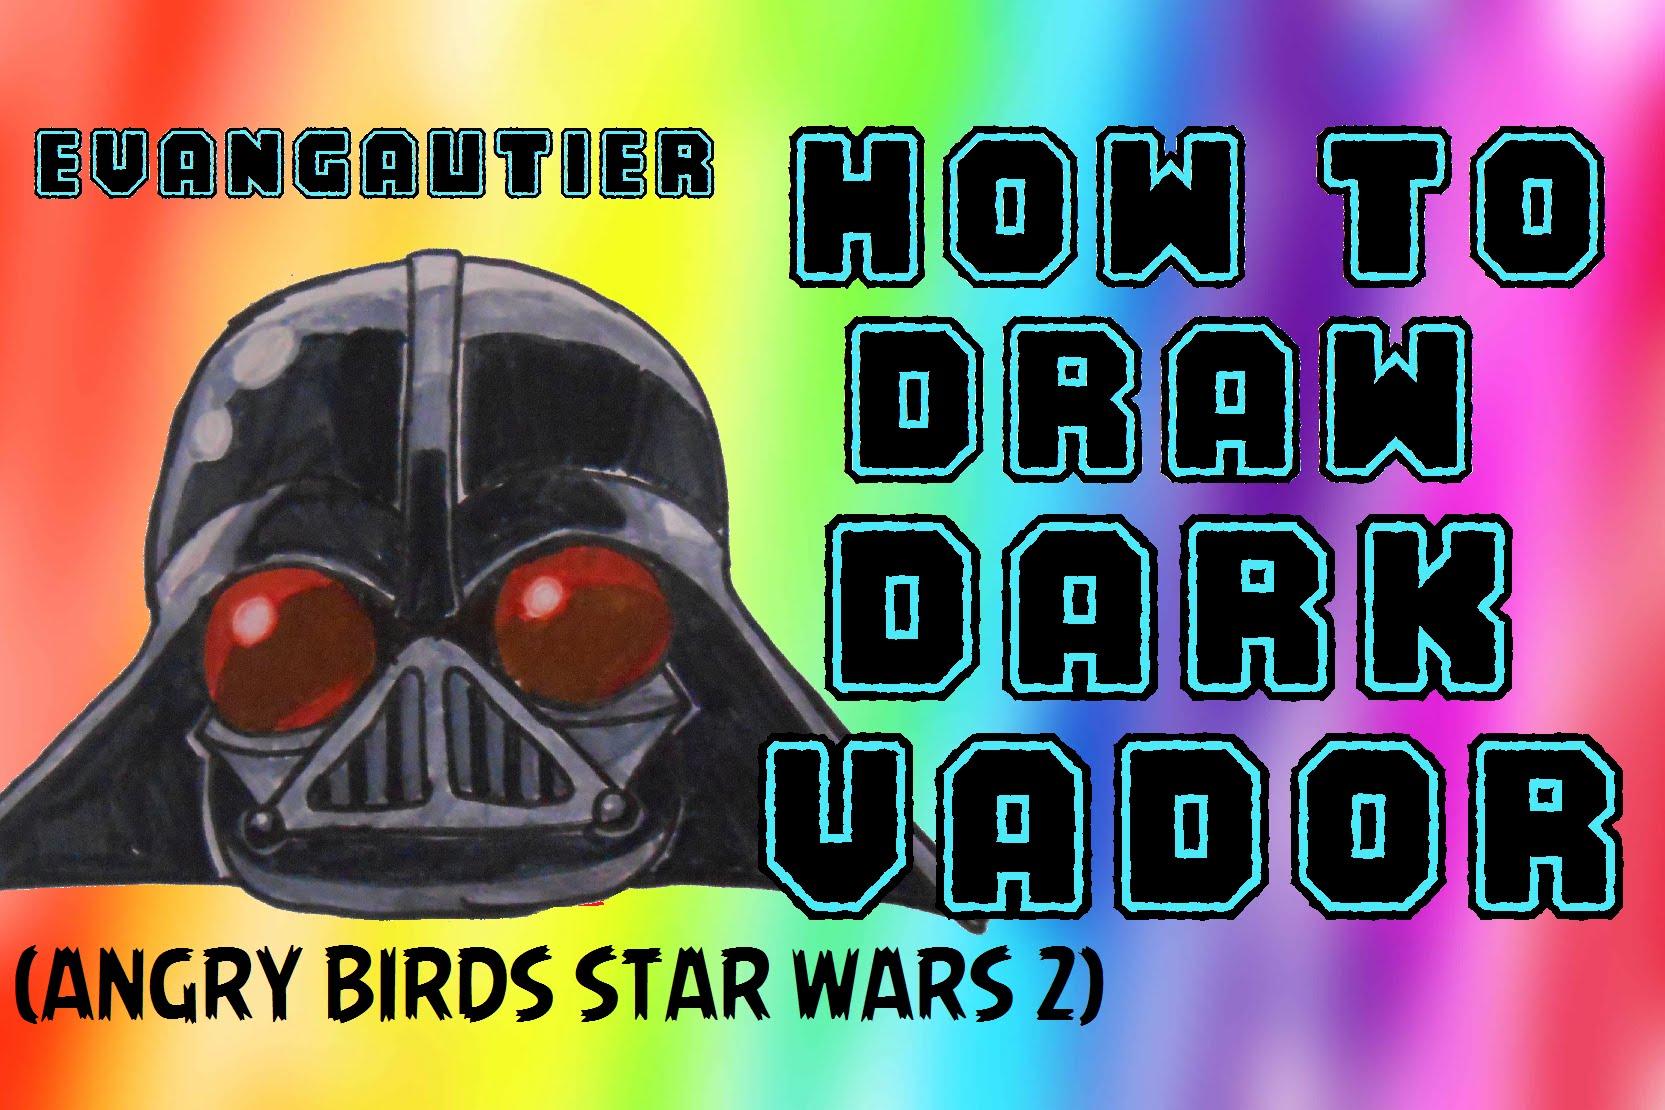 Drawn darth vader darrh Birds to EvanGautier How Star